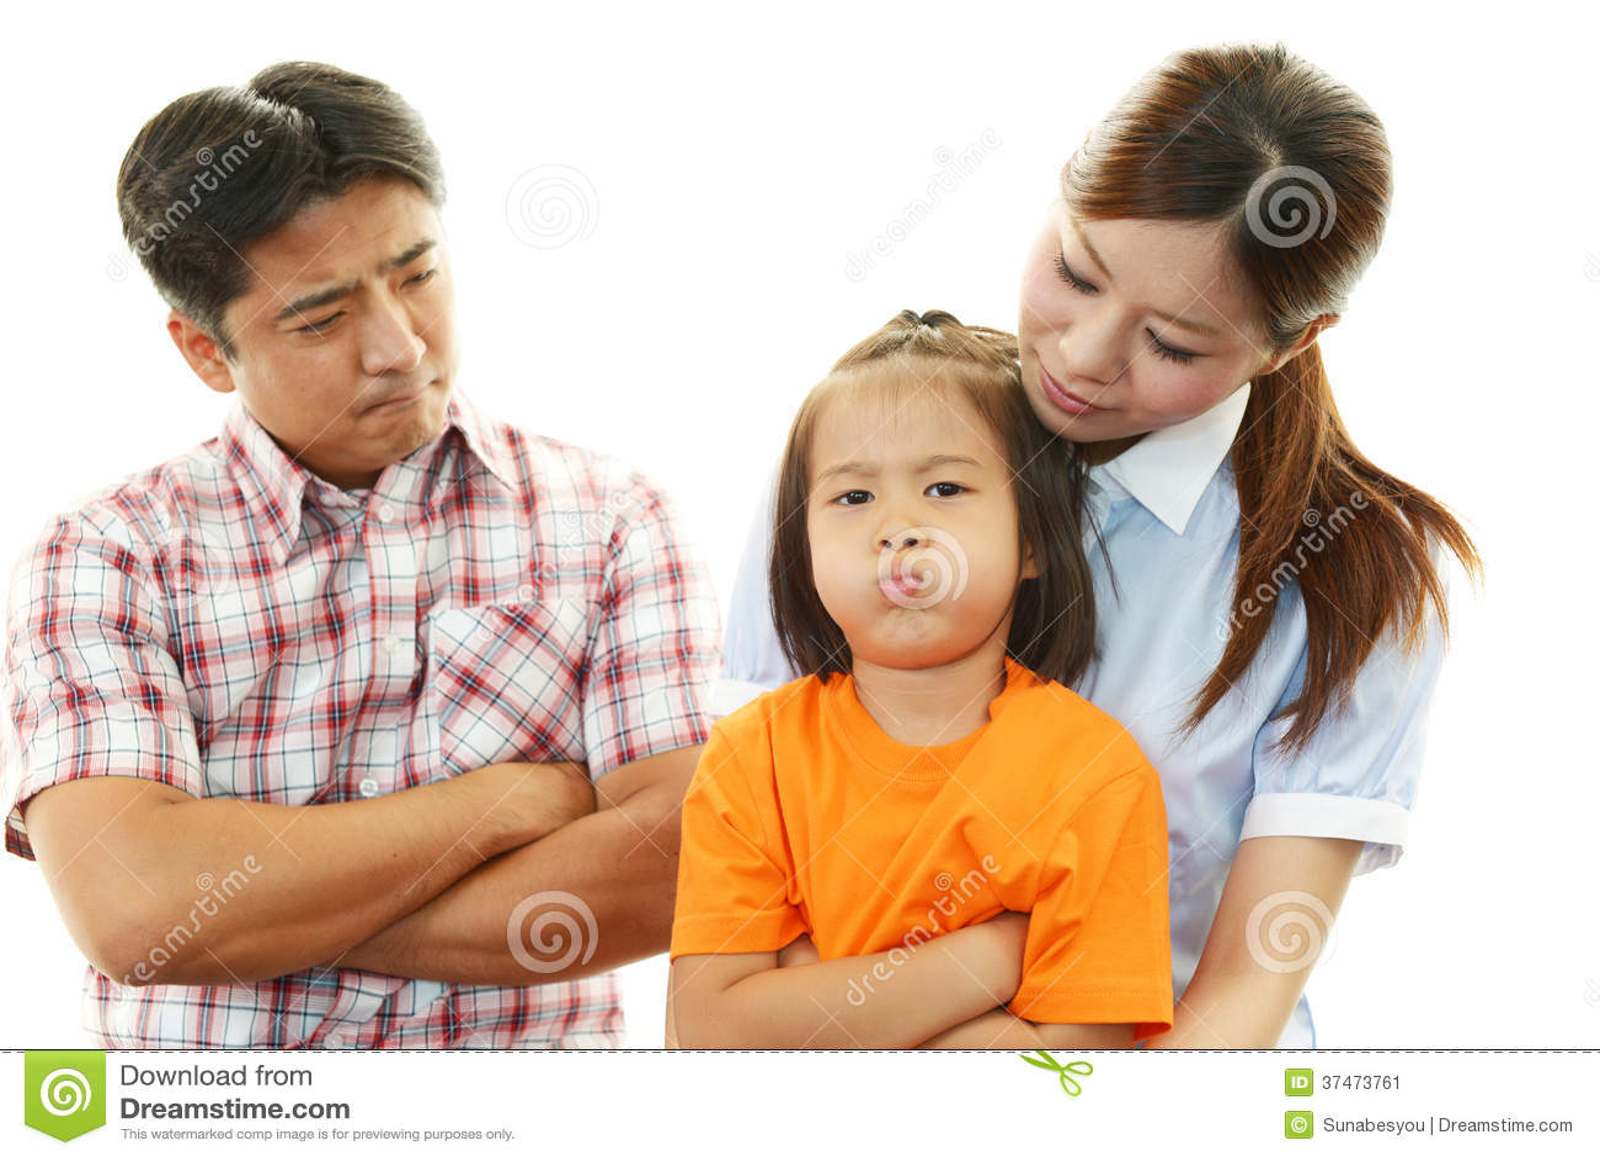 Two Angry Children Isolated On Smileydot Us